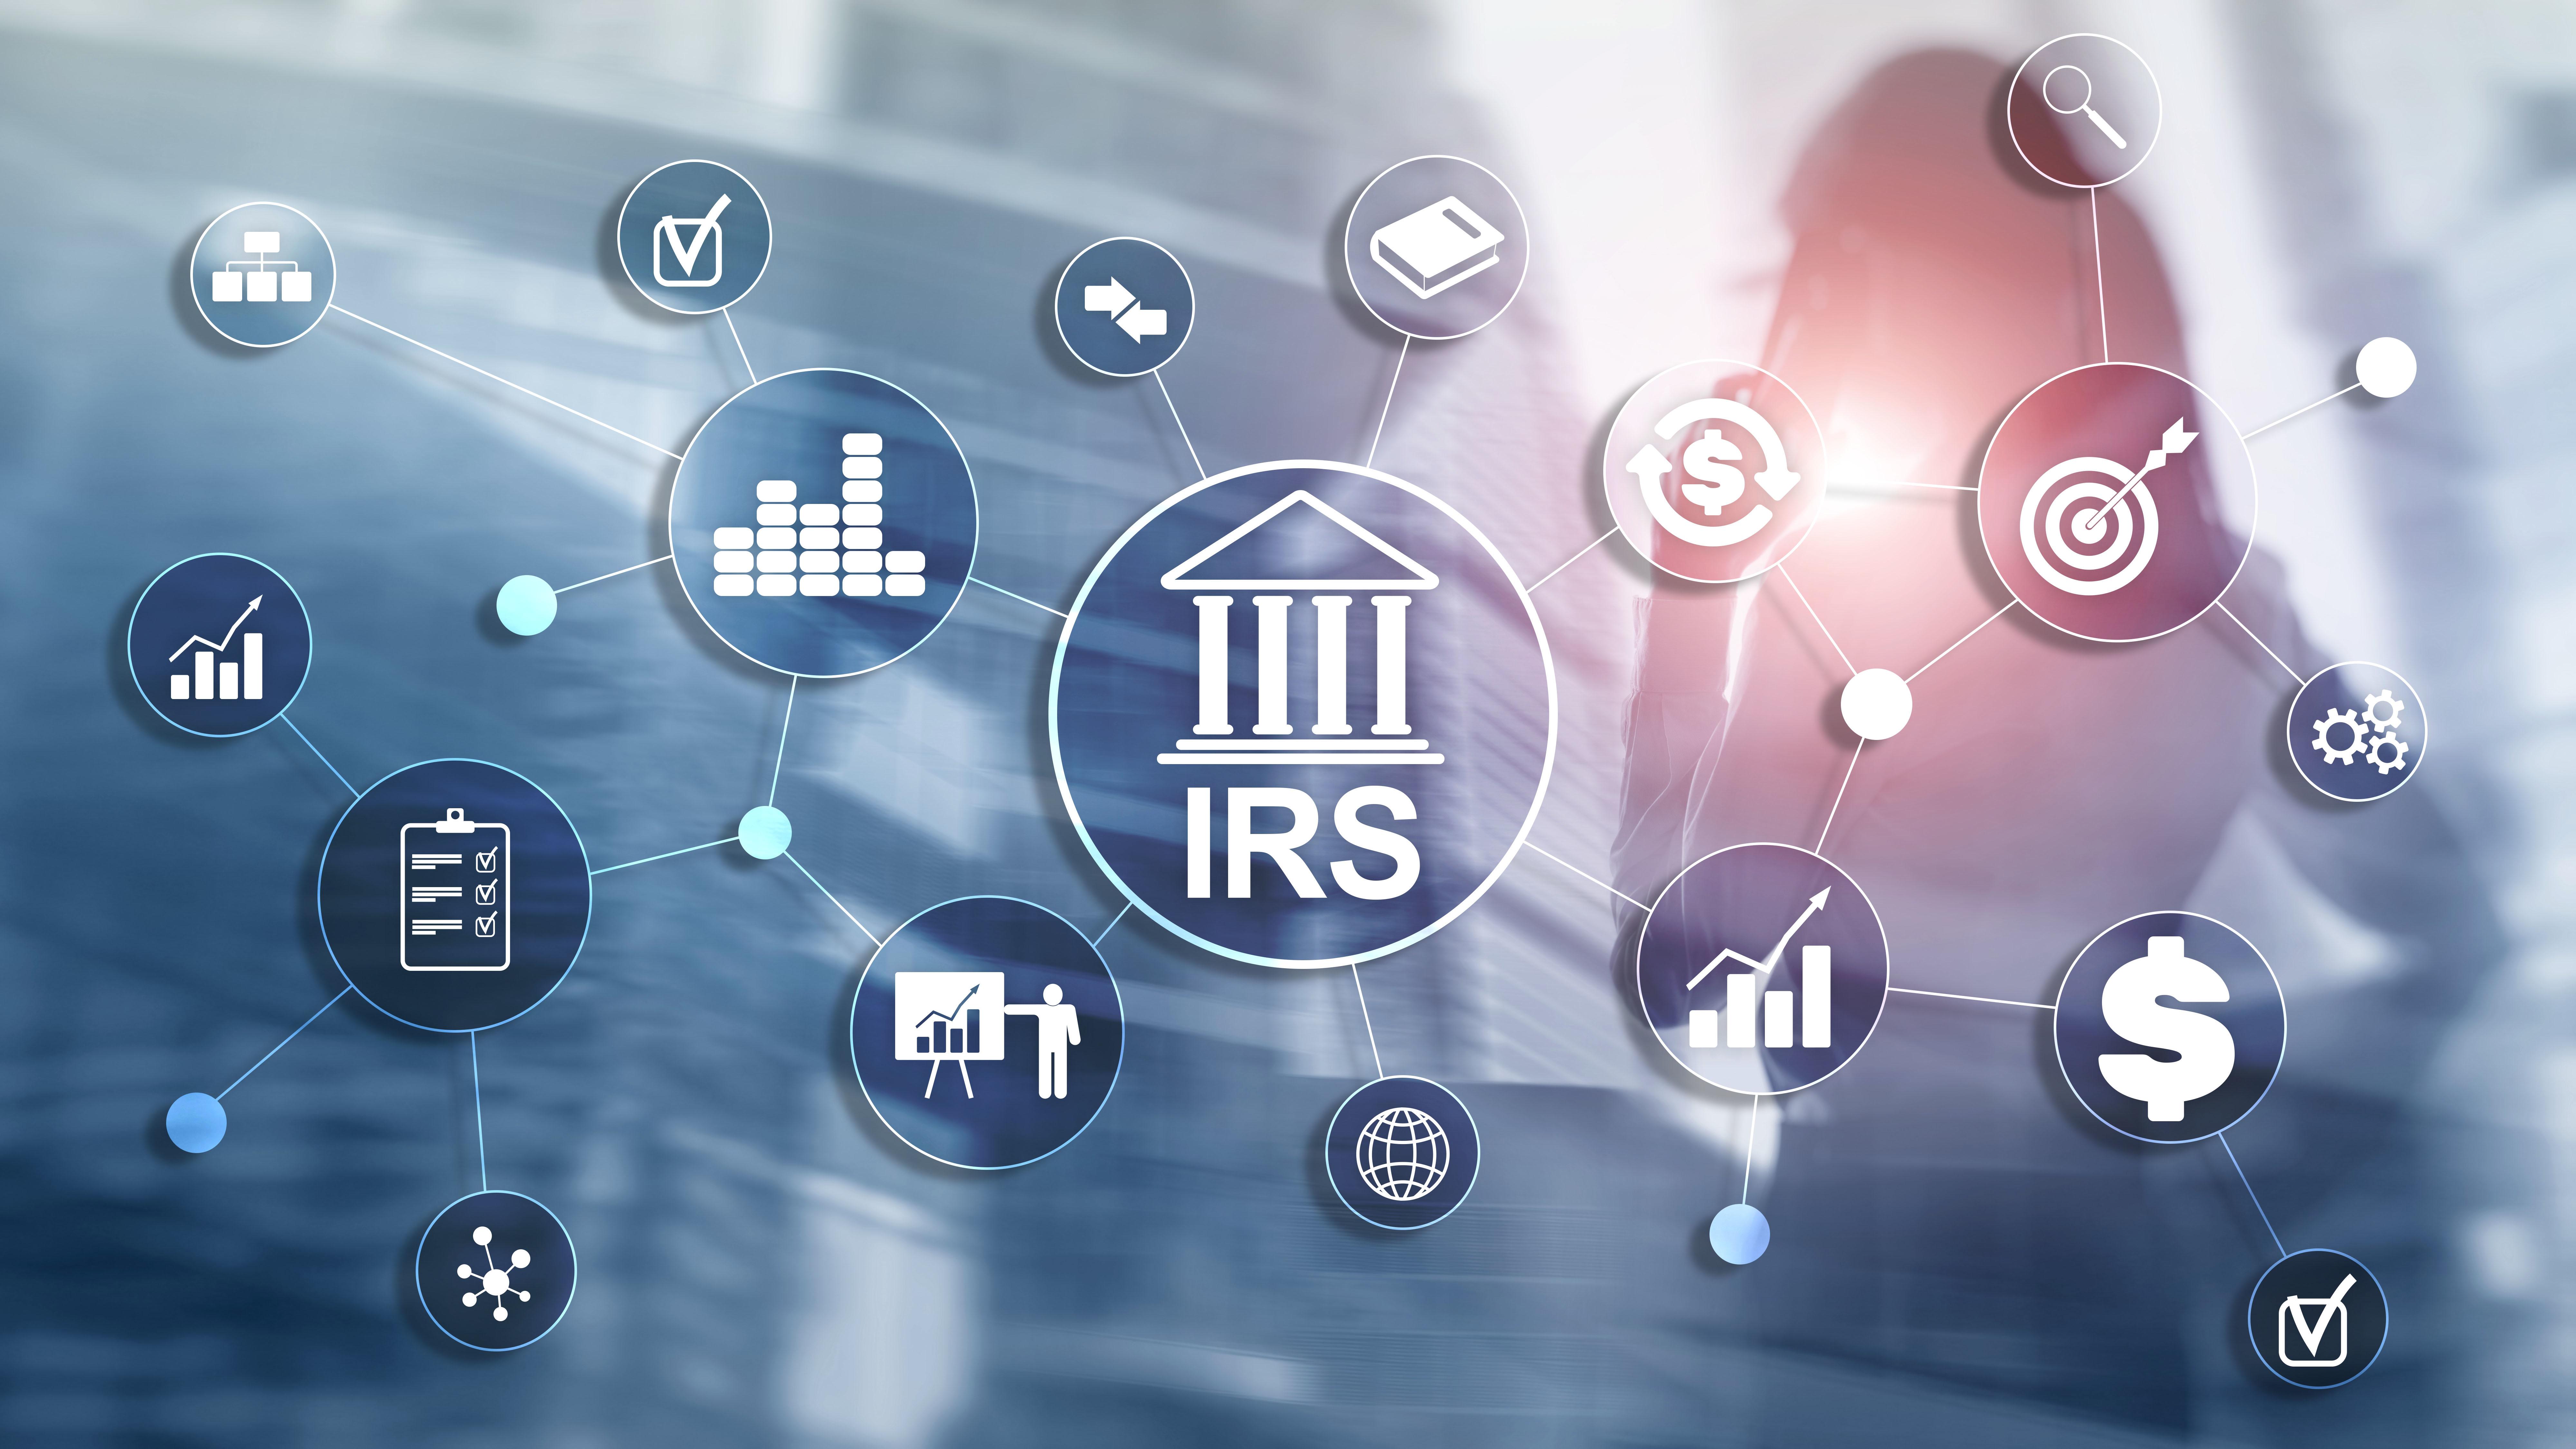 IRS - Guidance from Yeo & Yeo